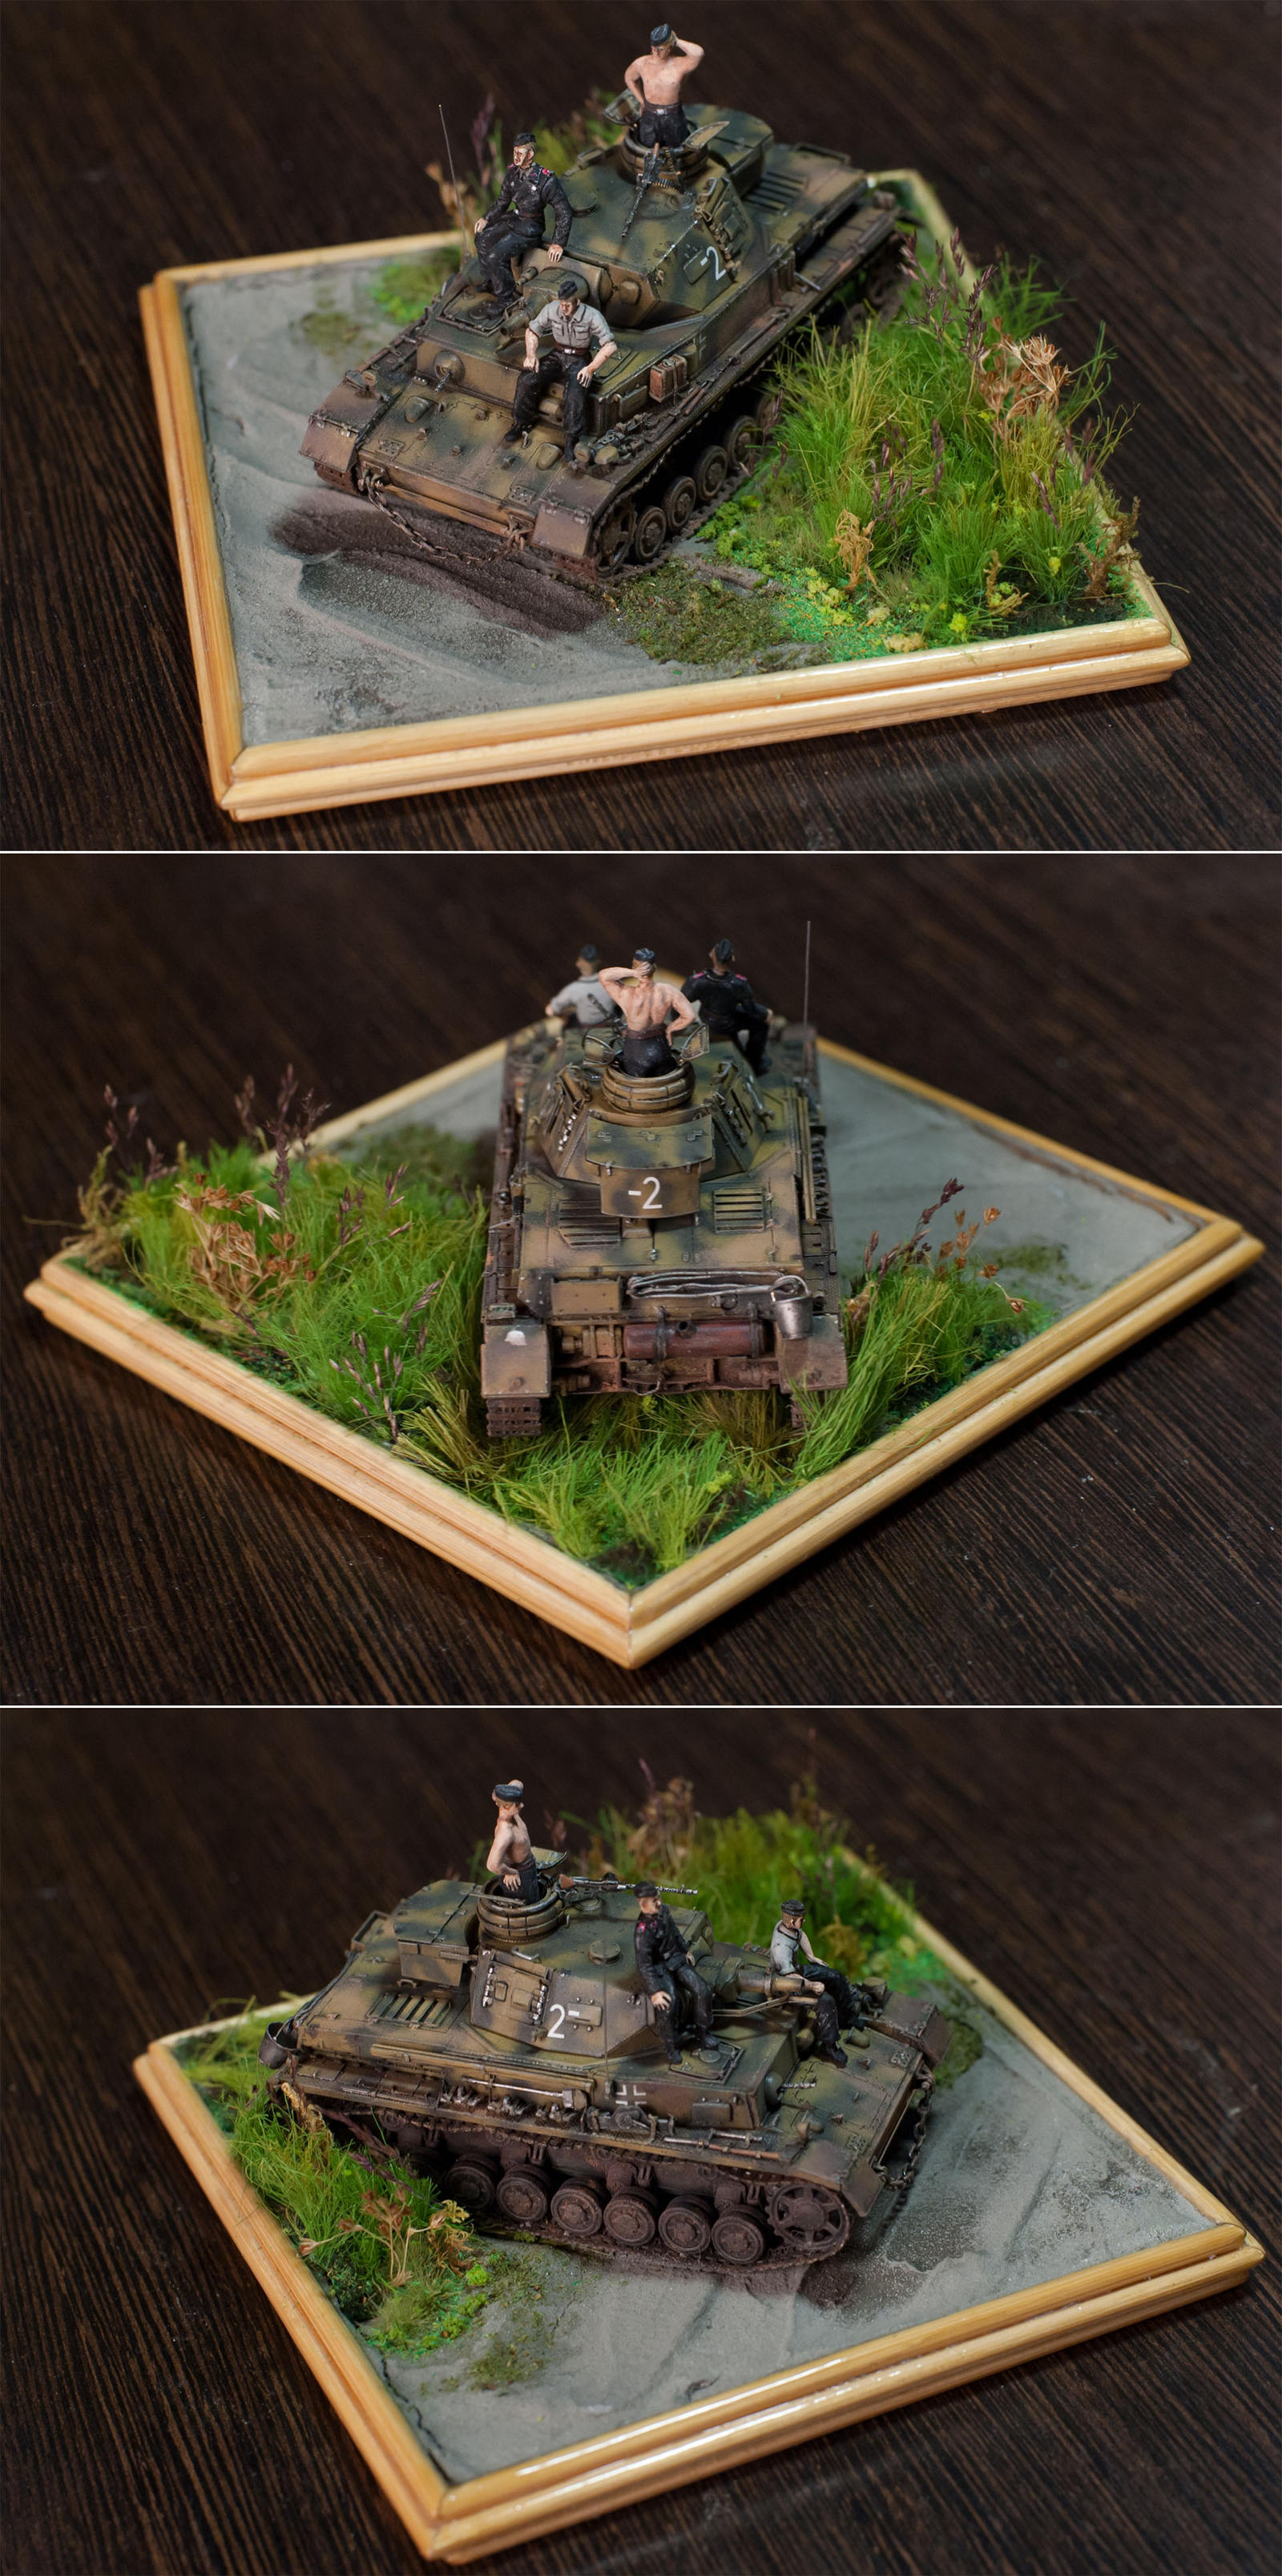 1/72 PZ IV Ausf F1. Details by Chrysomela on DeviantArt